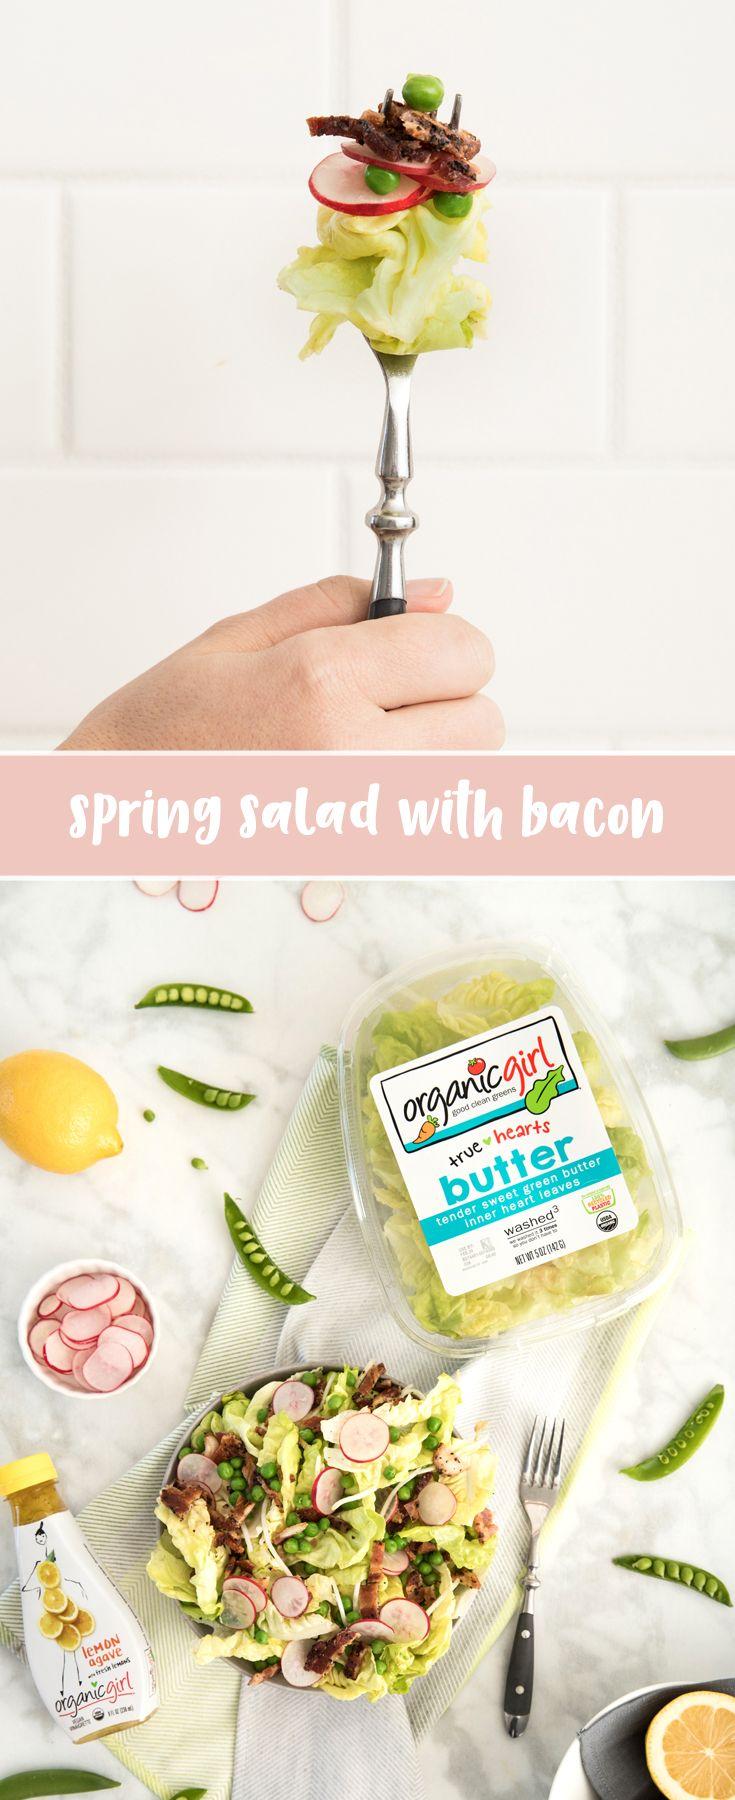 Spring Salad With Bacon Iloveorganicgirl Recipe Spring Salad Healthy Lunch Salad Bacon [ 1800 x 735 Pixel ]